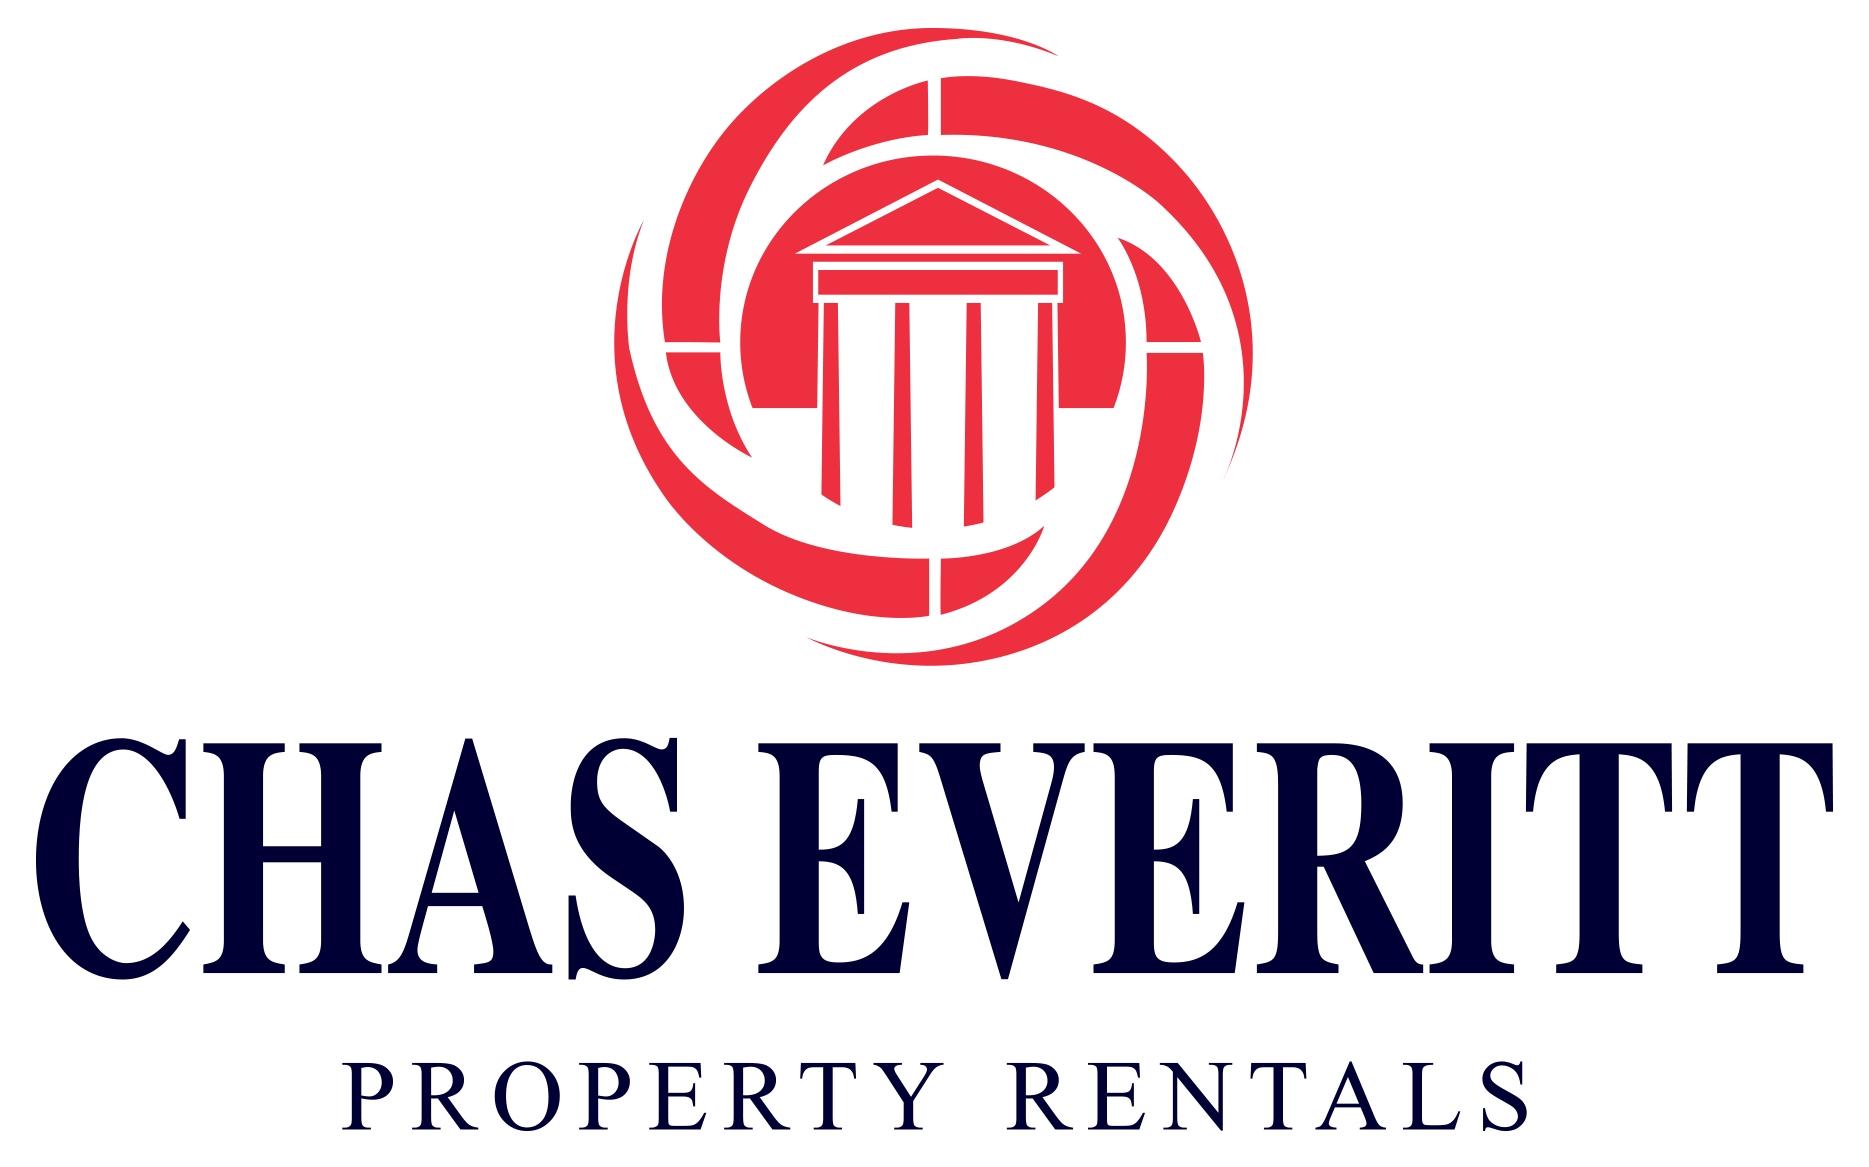 Chas Everitt Property Rentals logo